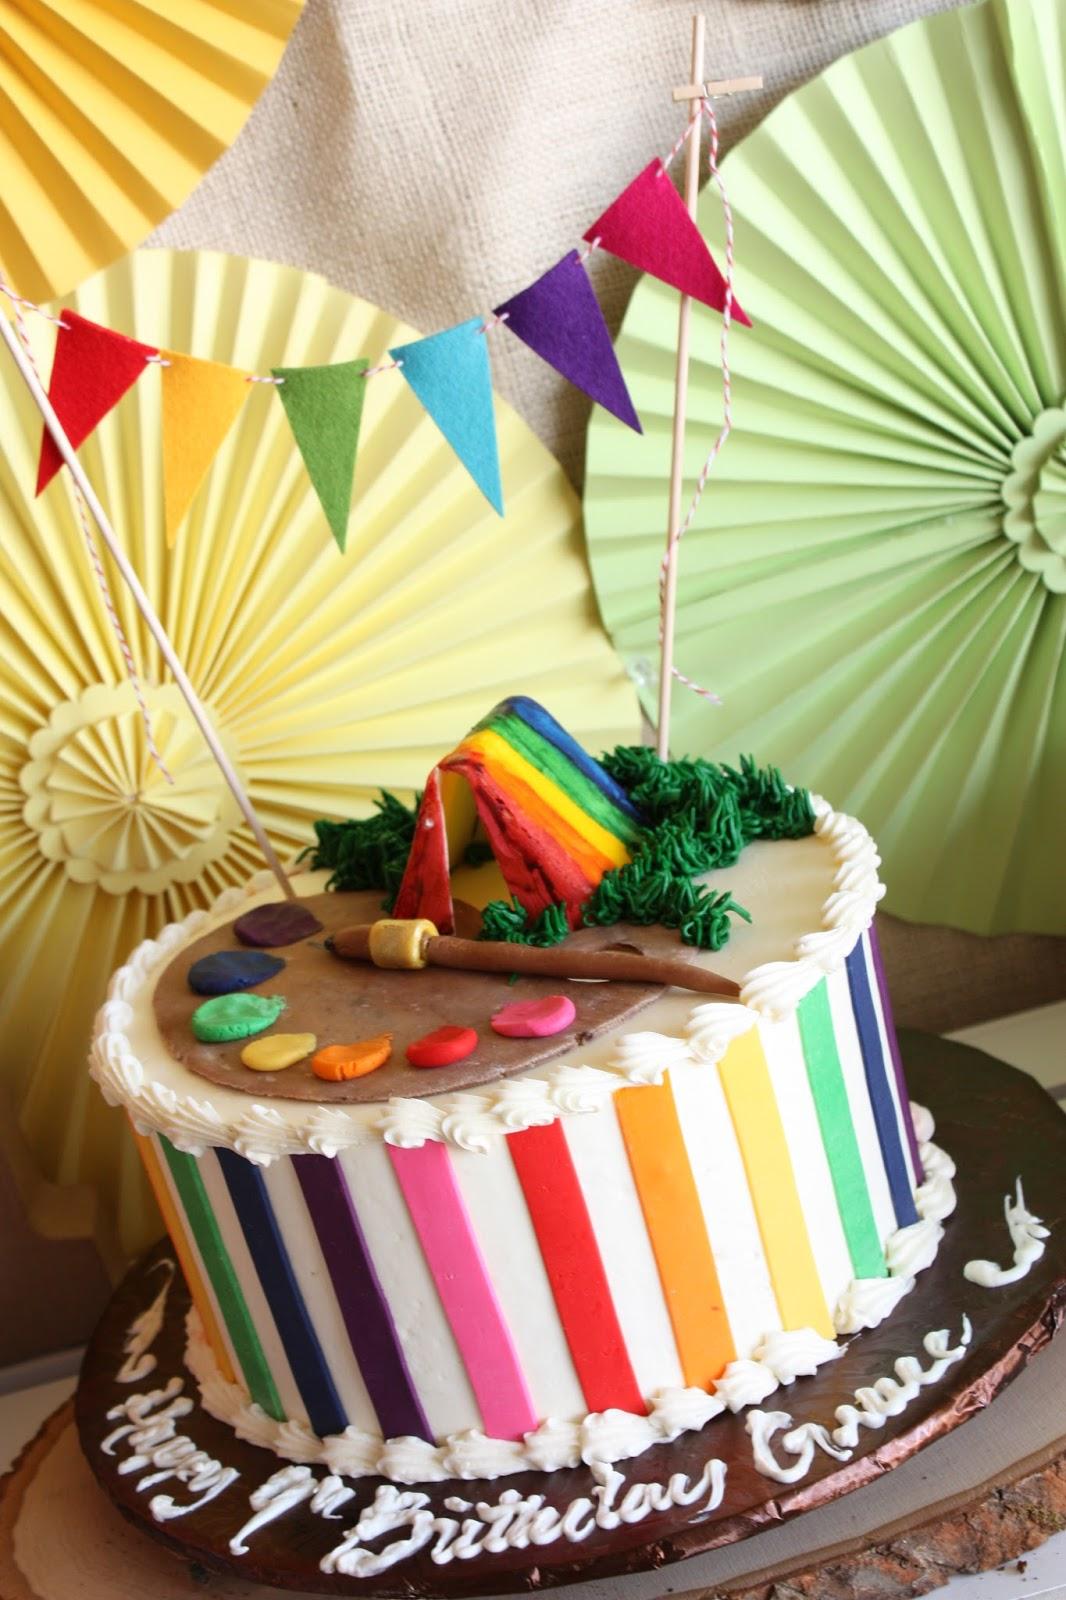 Splurge Bakery Rainbow Cake